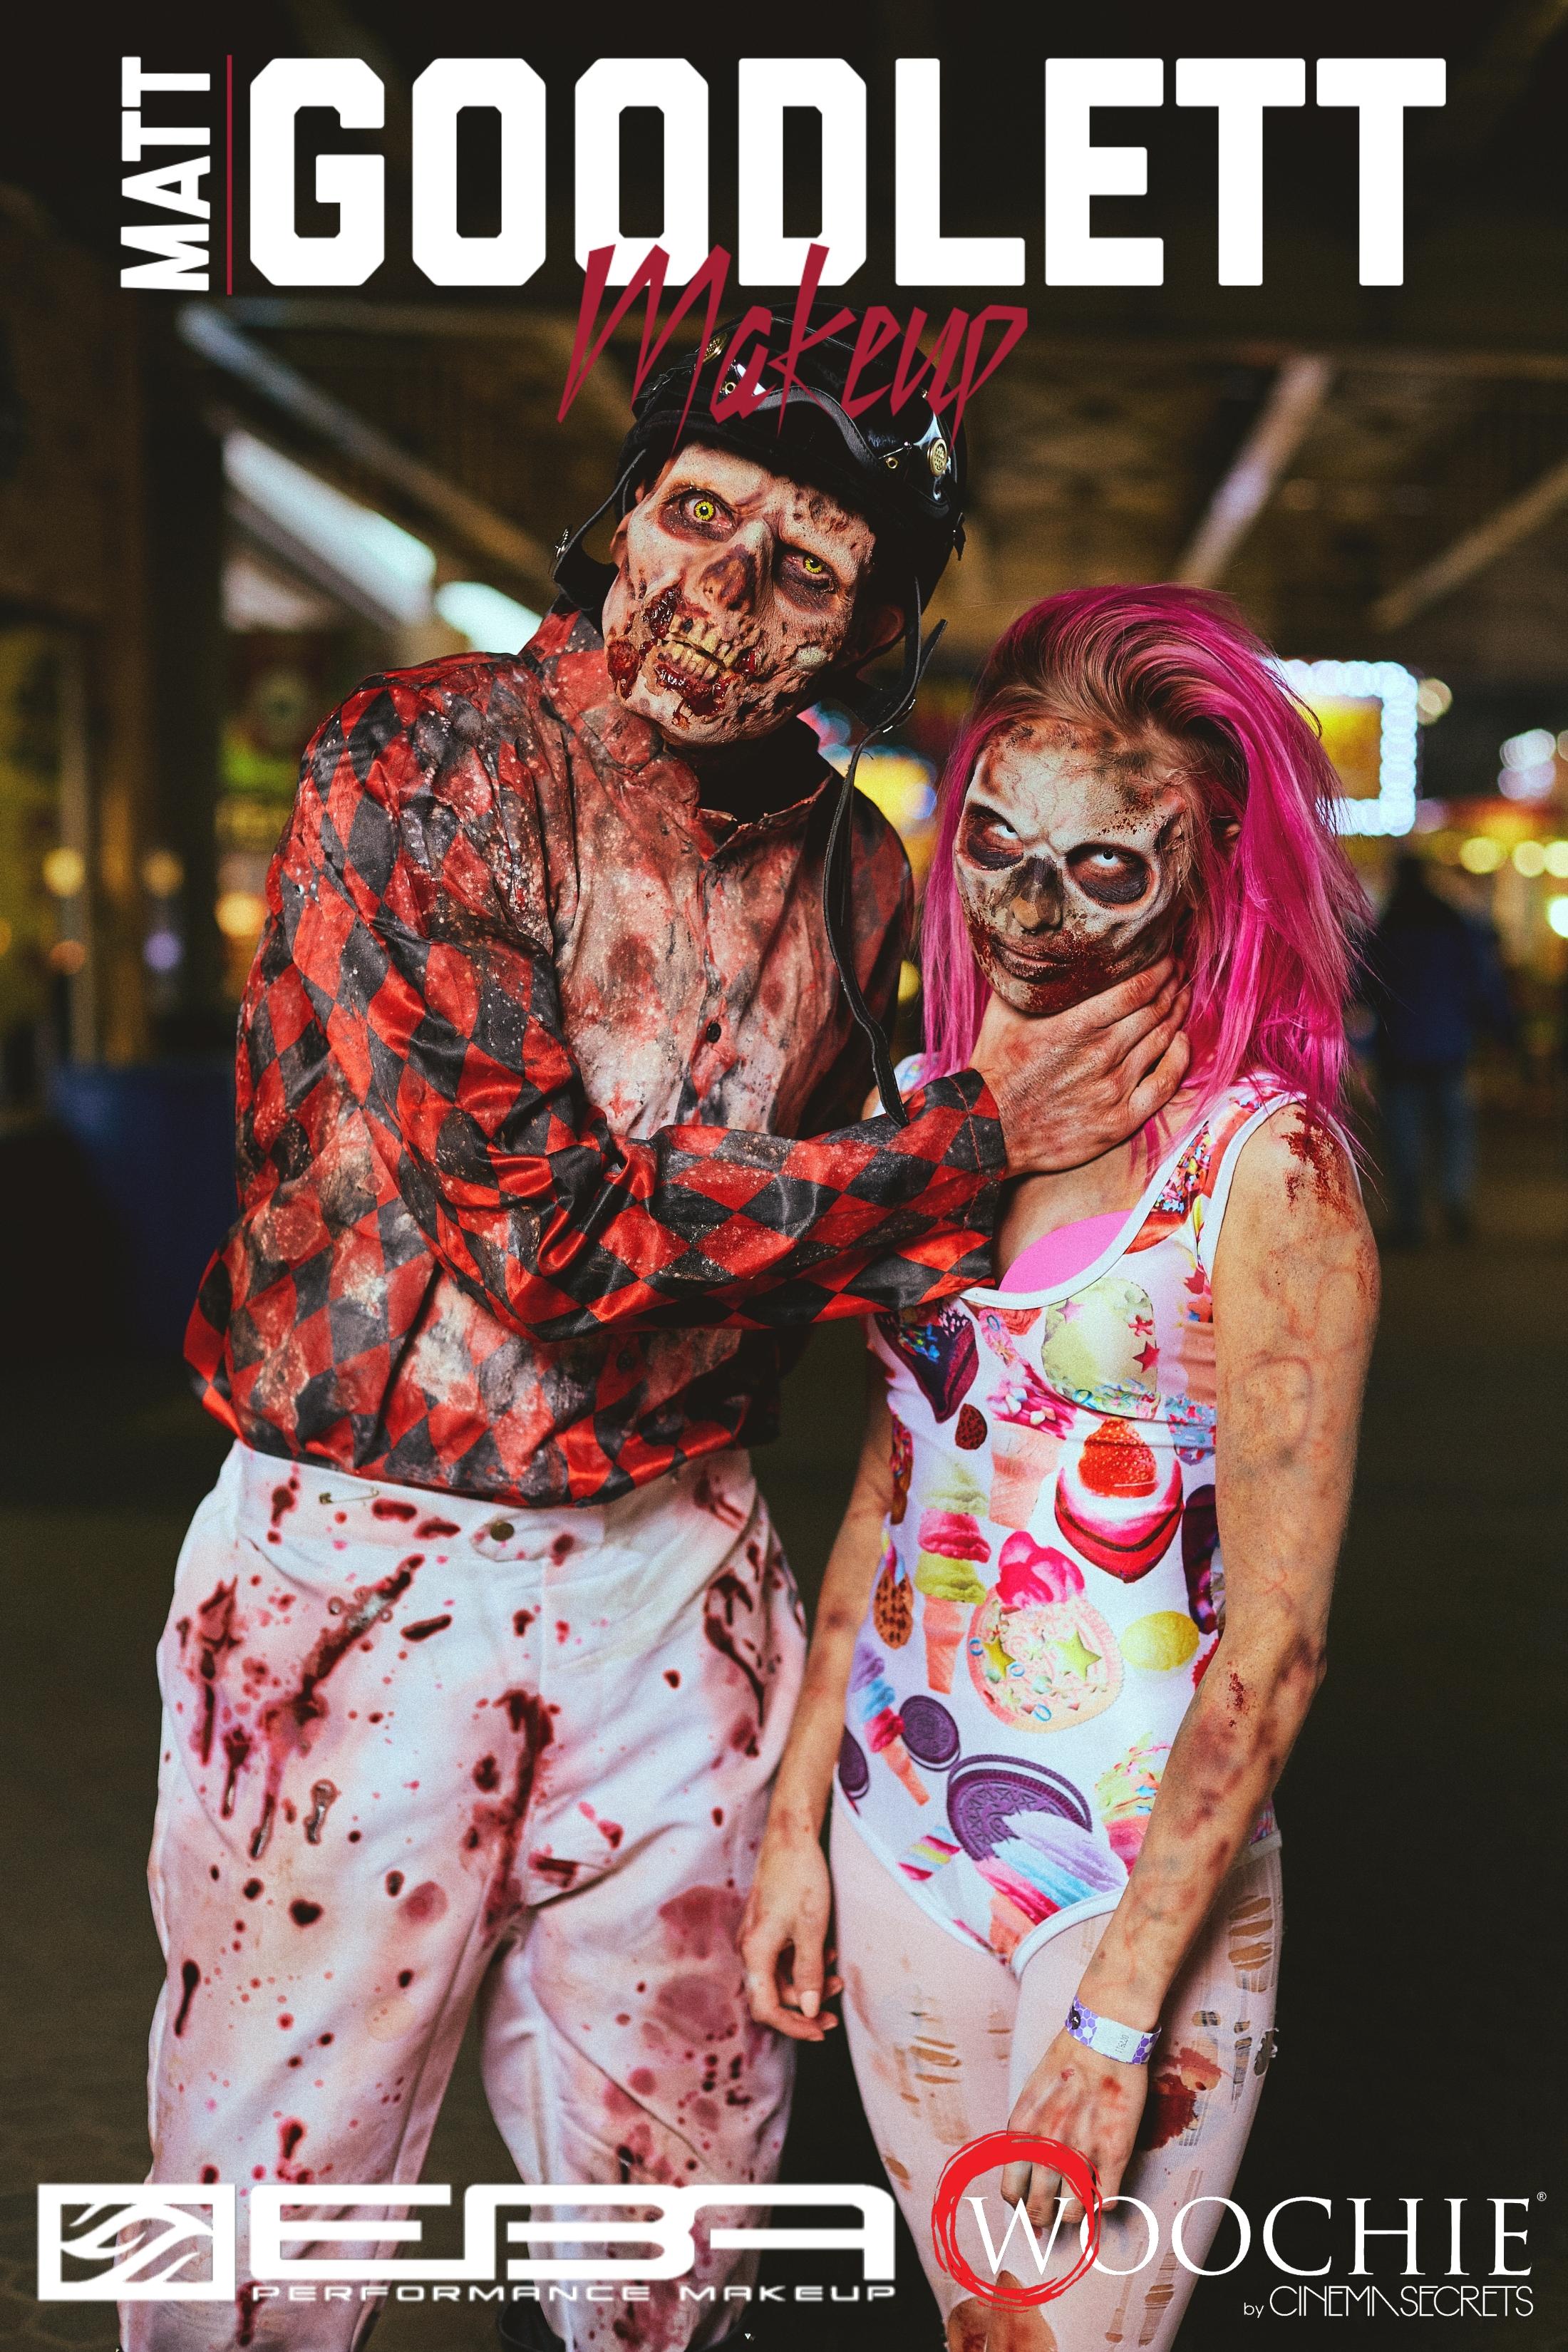 Photo of Jeff and Tabby by Tate Chmielewski